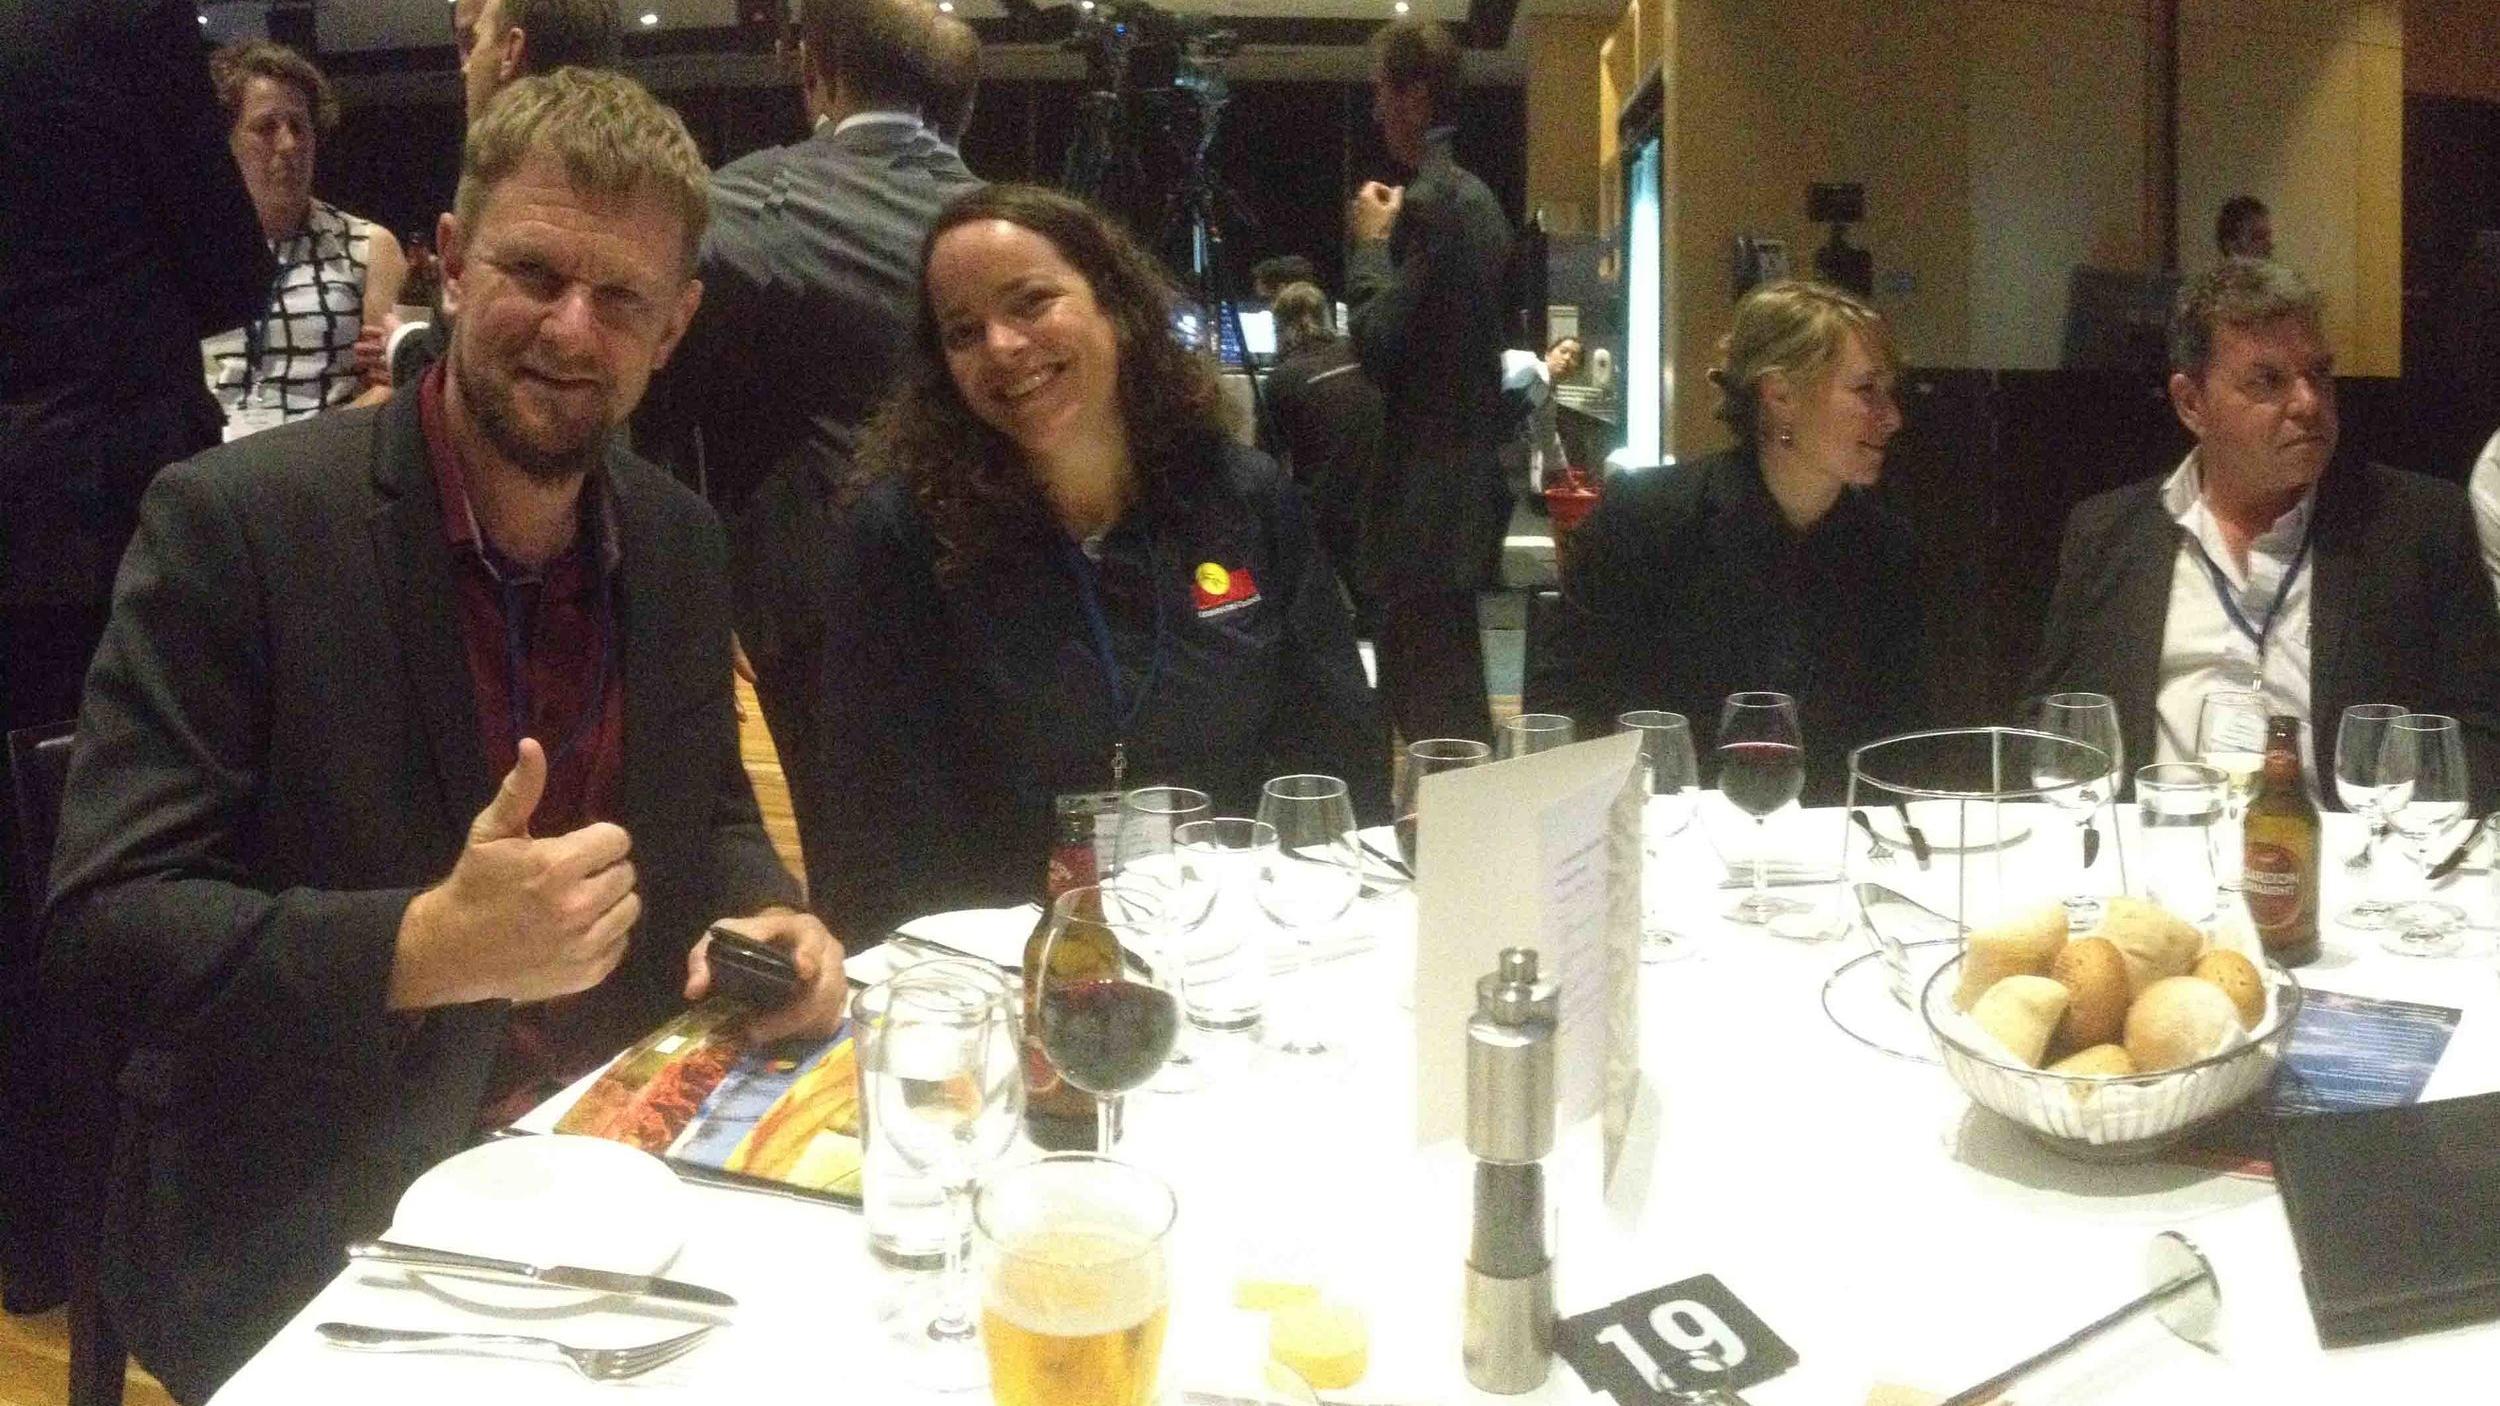 Famous faces enjoying dinner on table 19